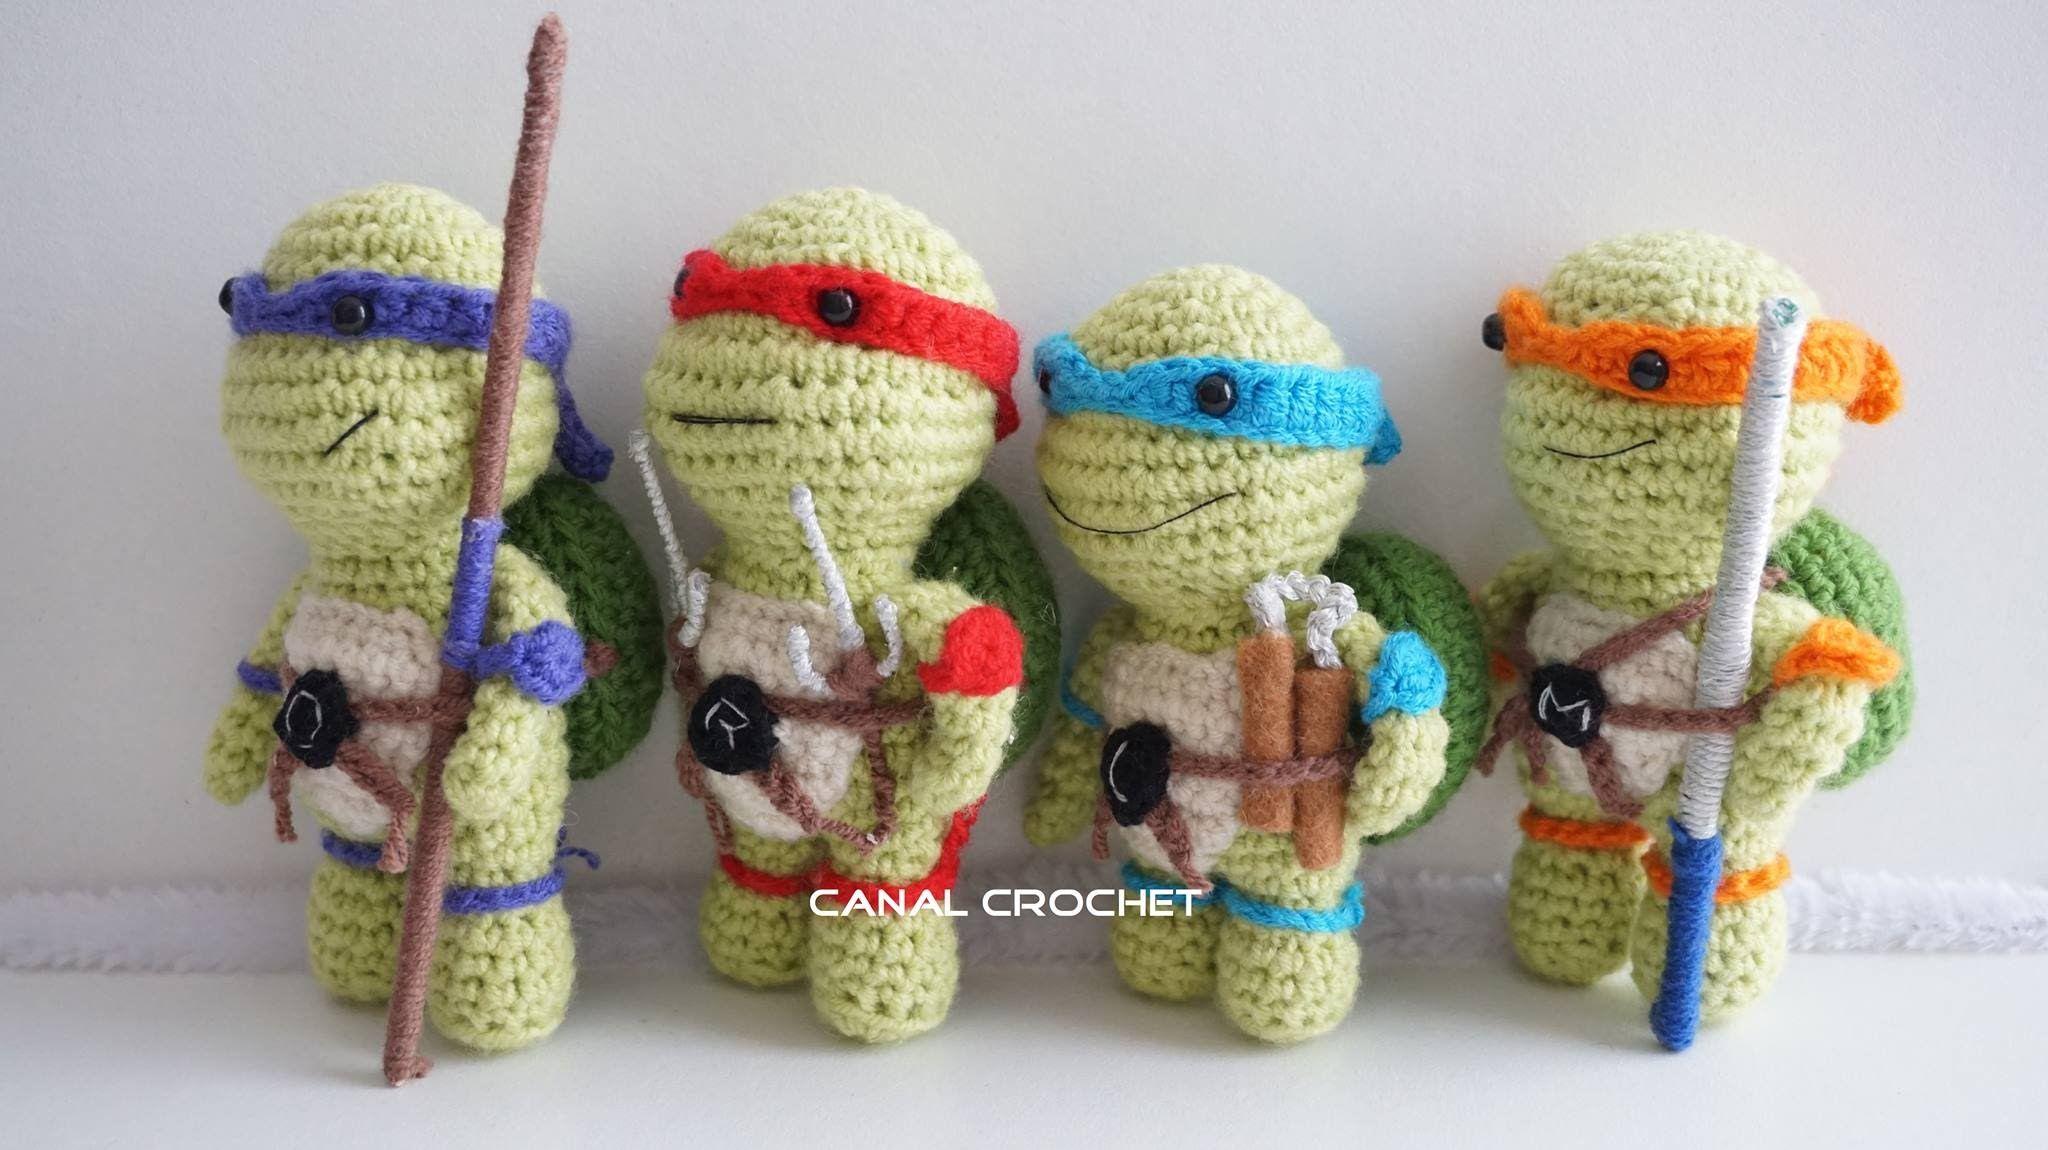 Amigurumi Tutorial Snoopy : Tortugas ninja amigurumi tutorial youtube crochet videos